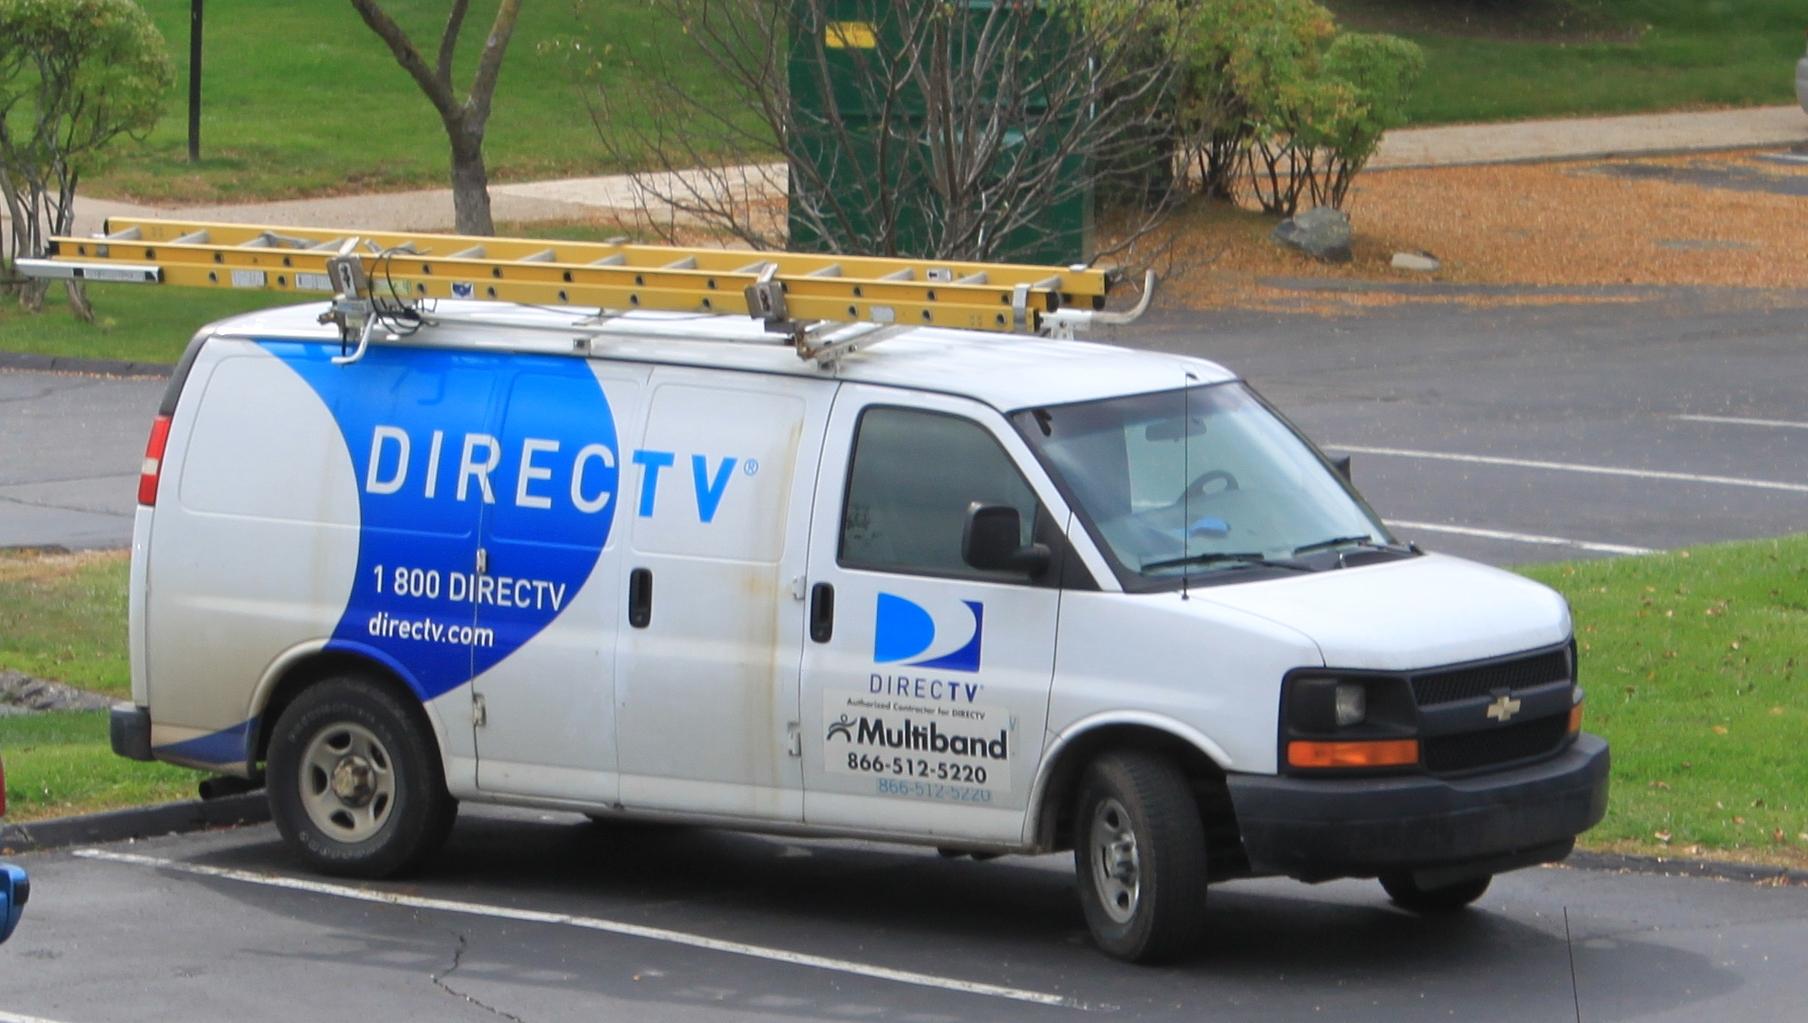 direct tv 2007 holden rodeo radio wiring diagram file directtv service van ypsilanti township michigan jpg